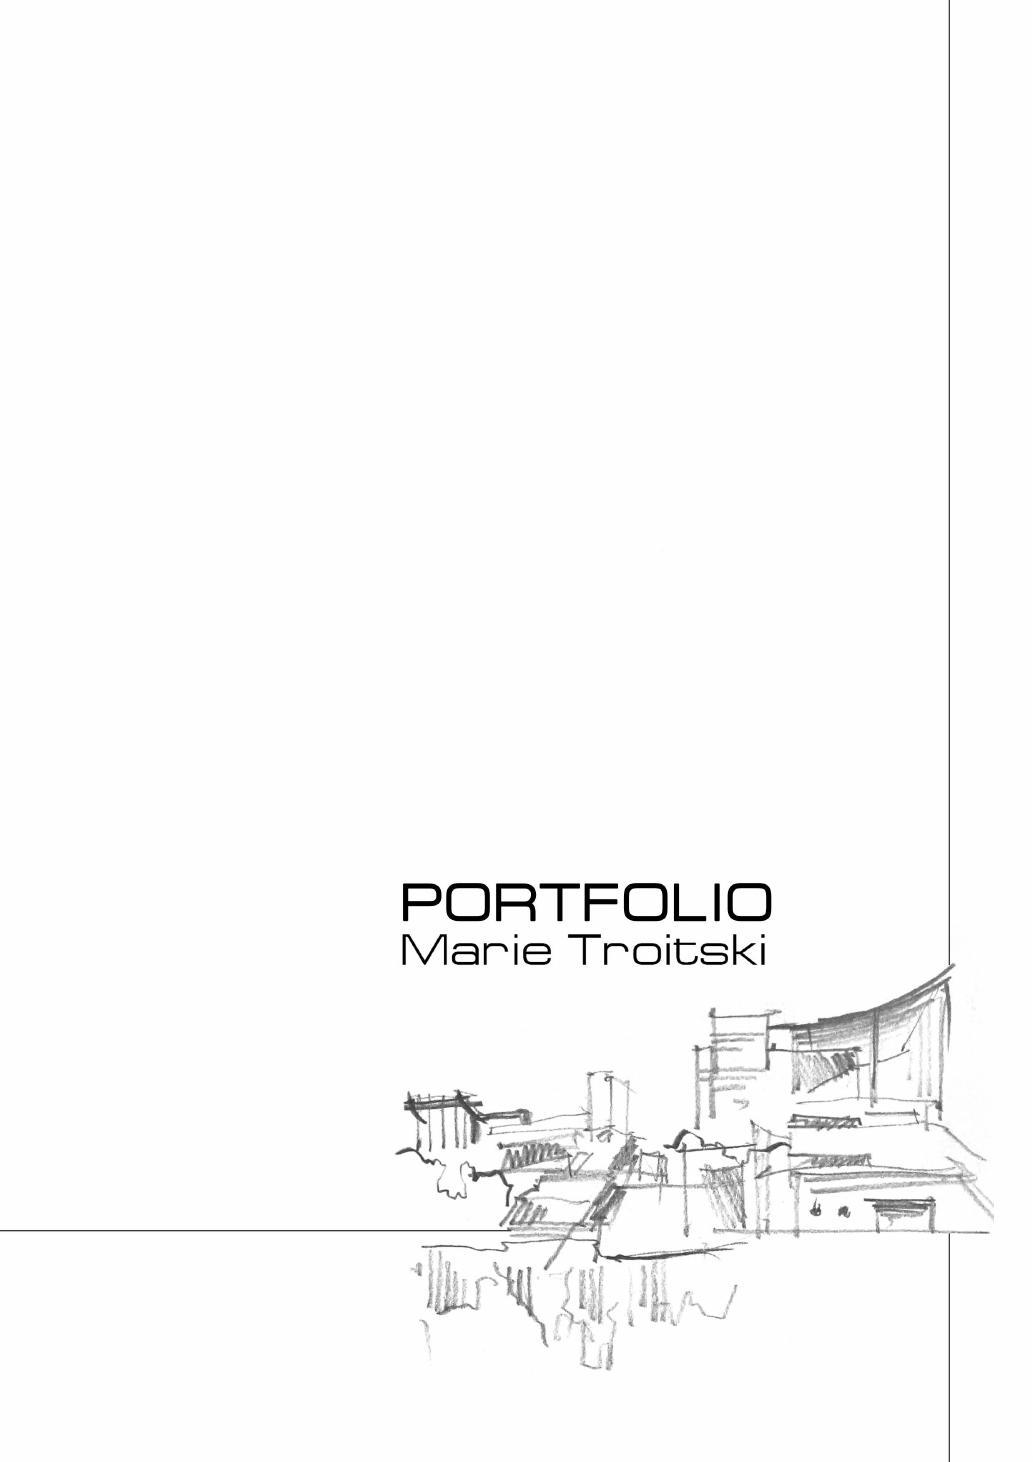 portfolio title page examples